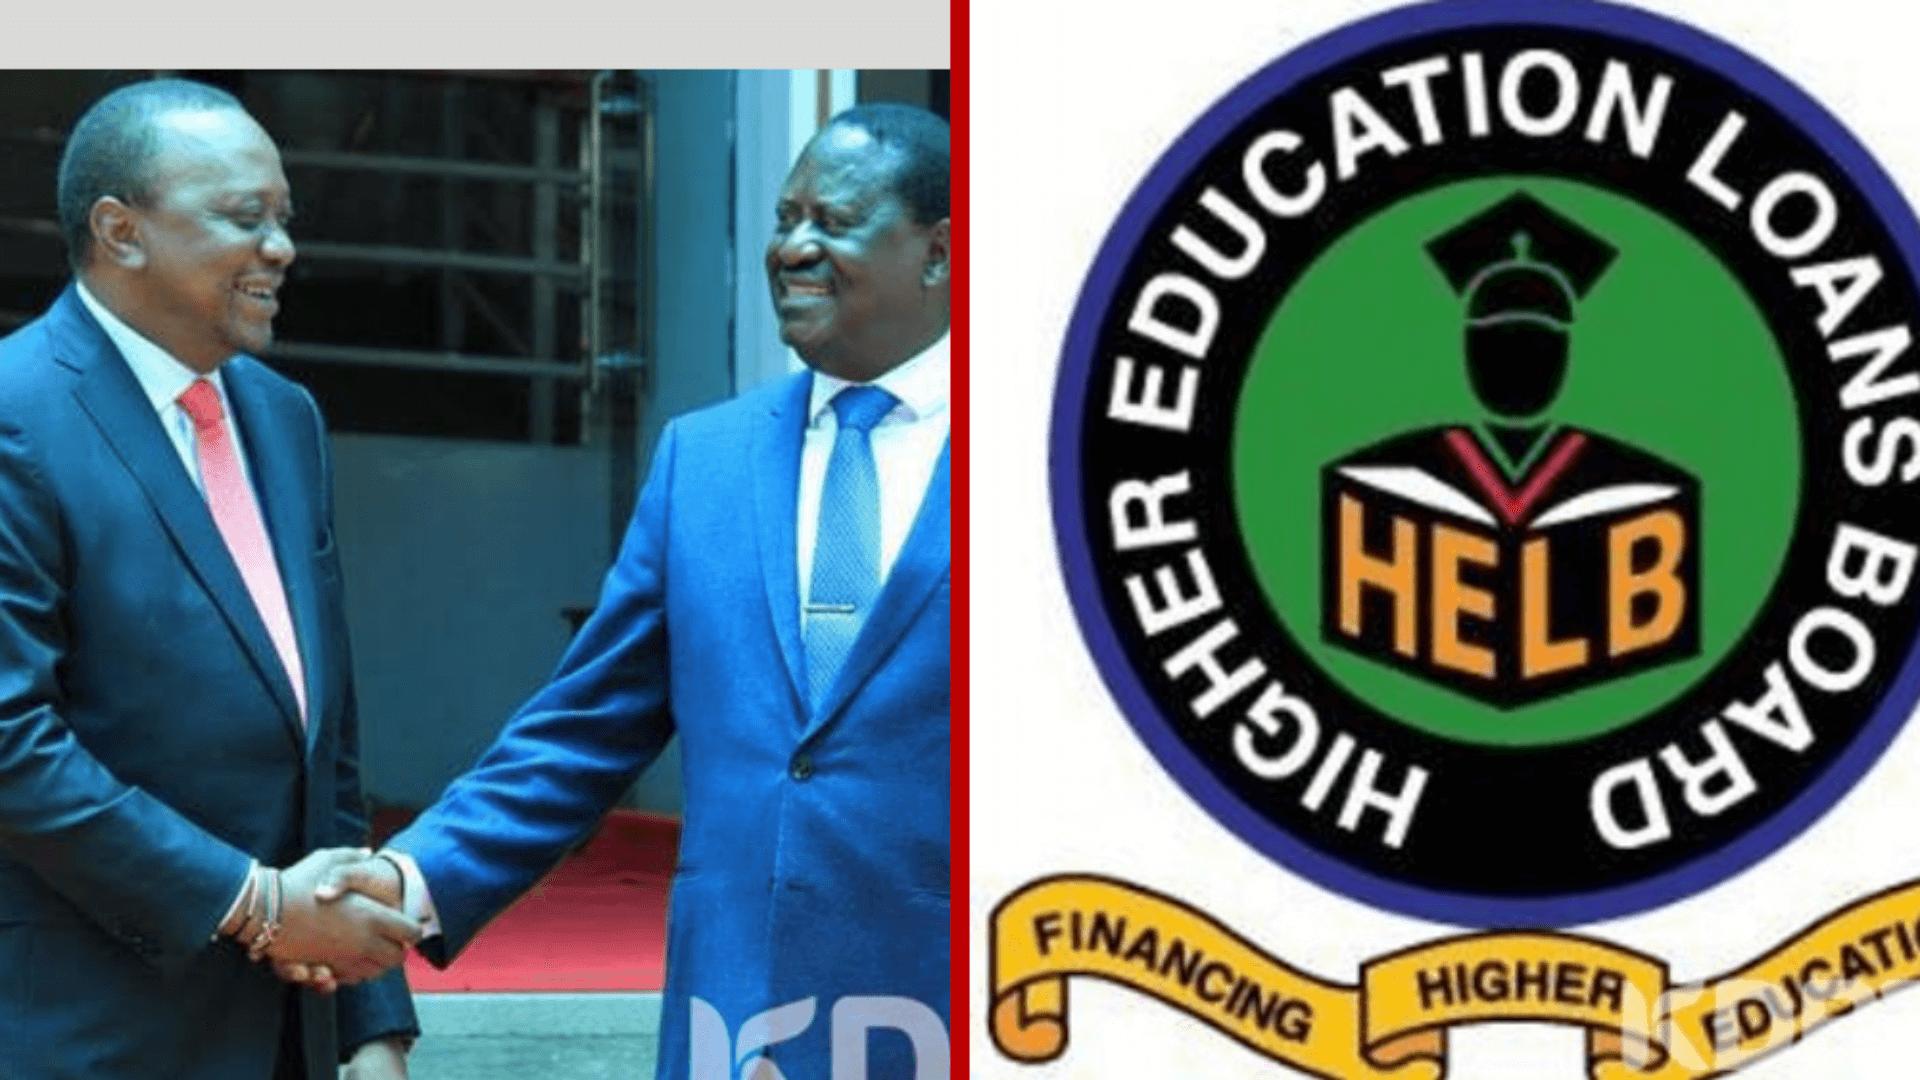 helb has rejected bbi proposals